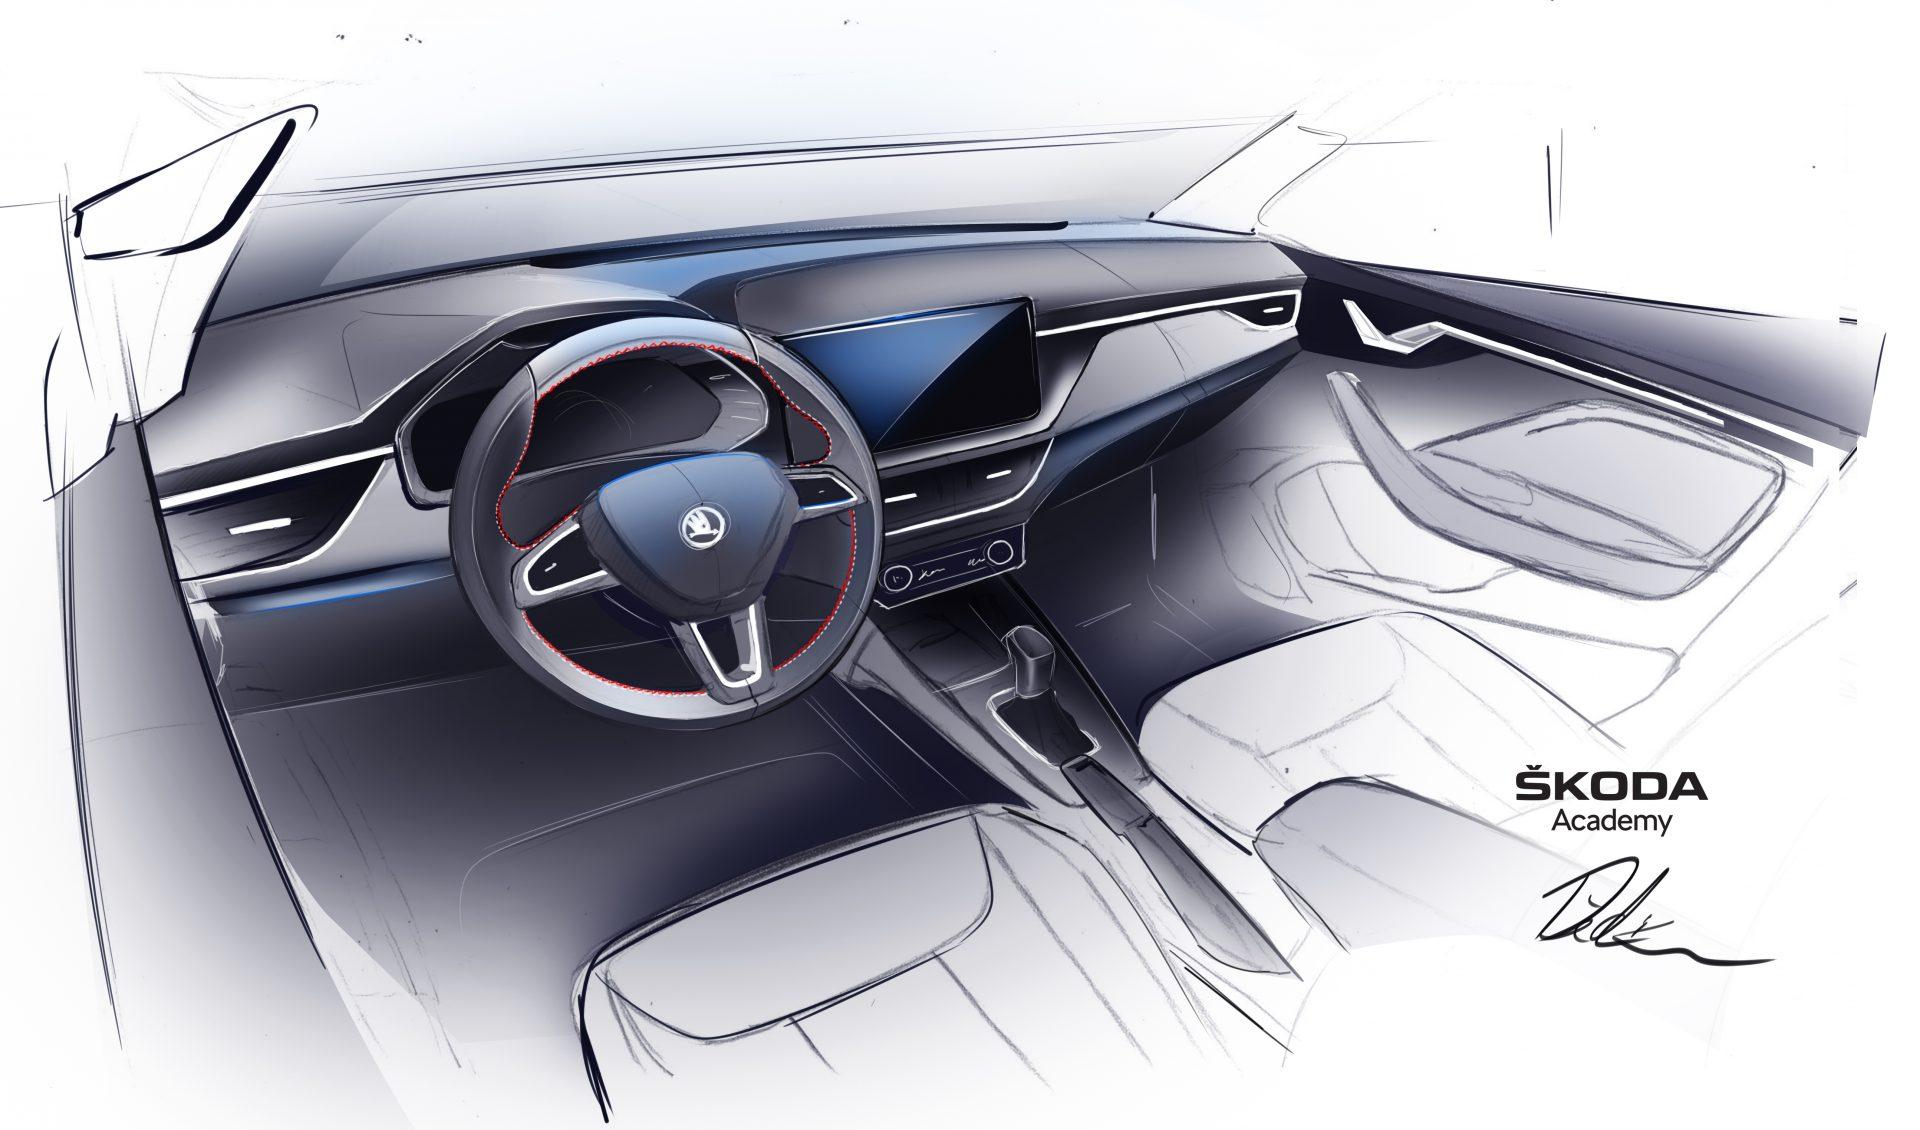 SKODA Academy concept car - Σχέδιο